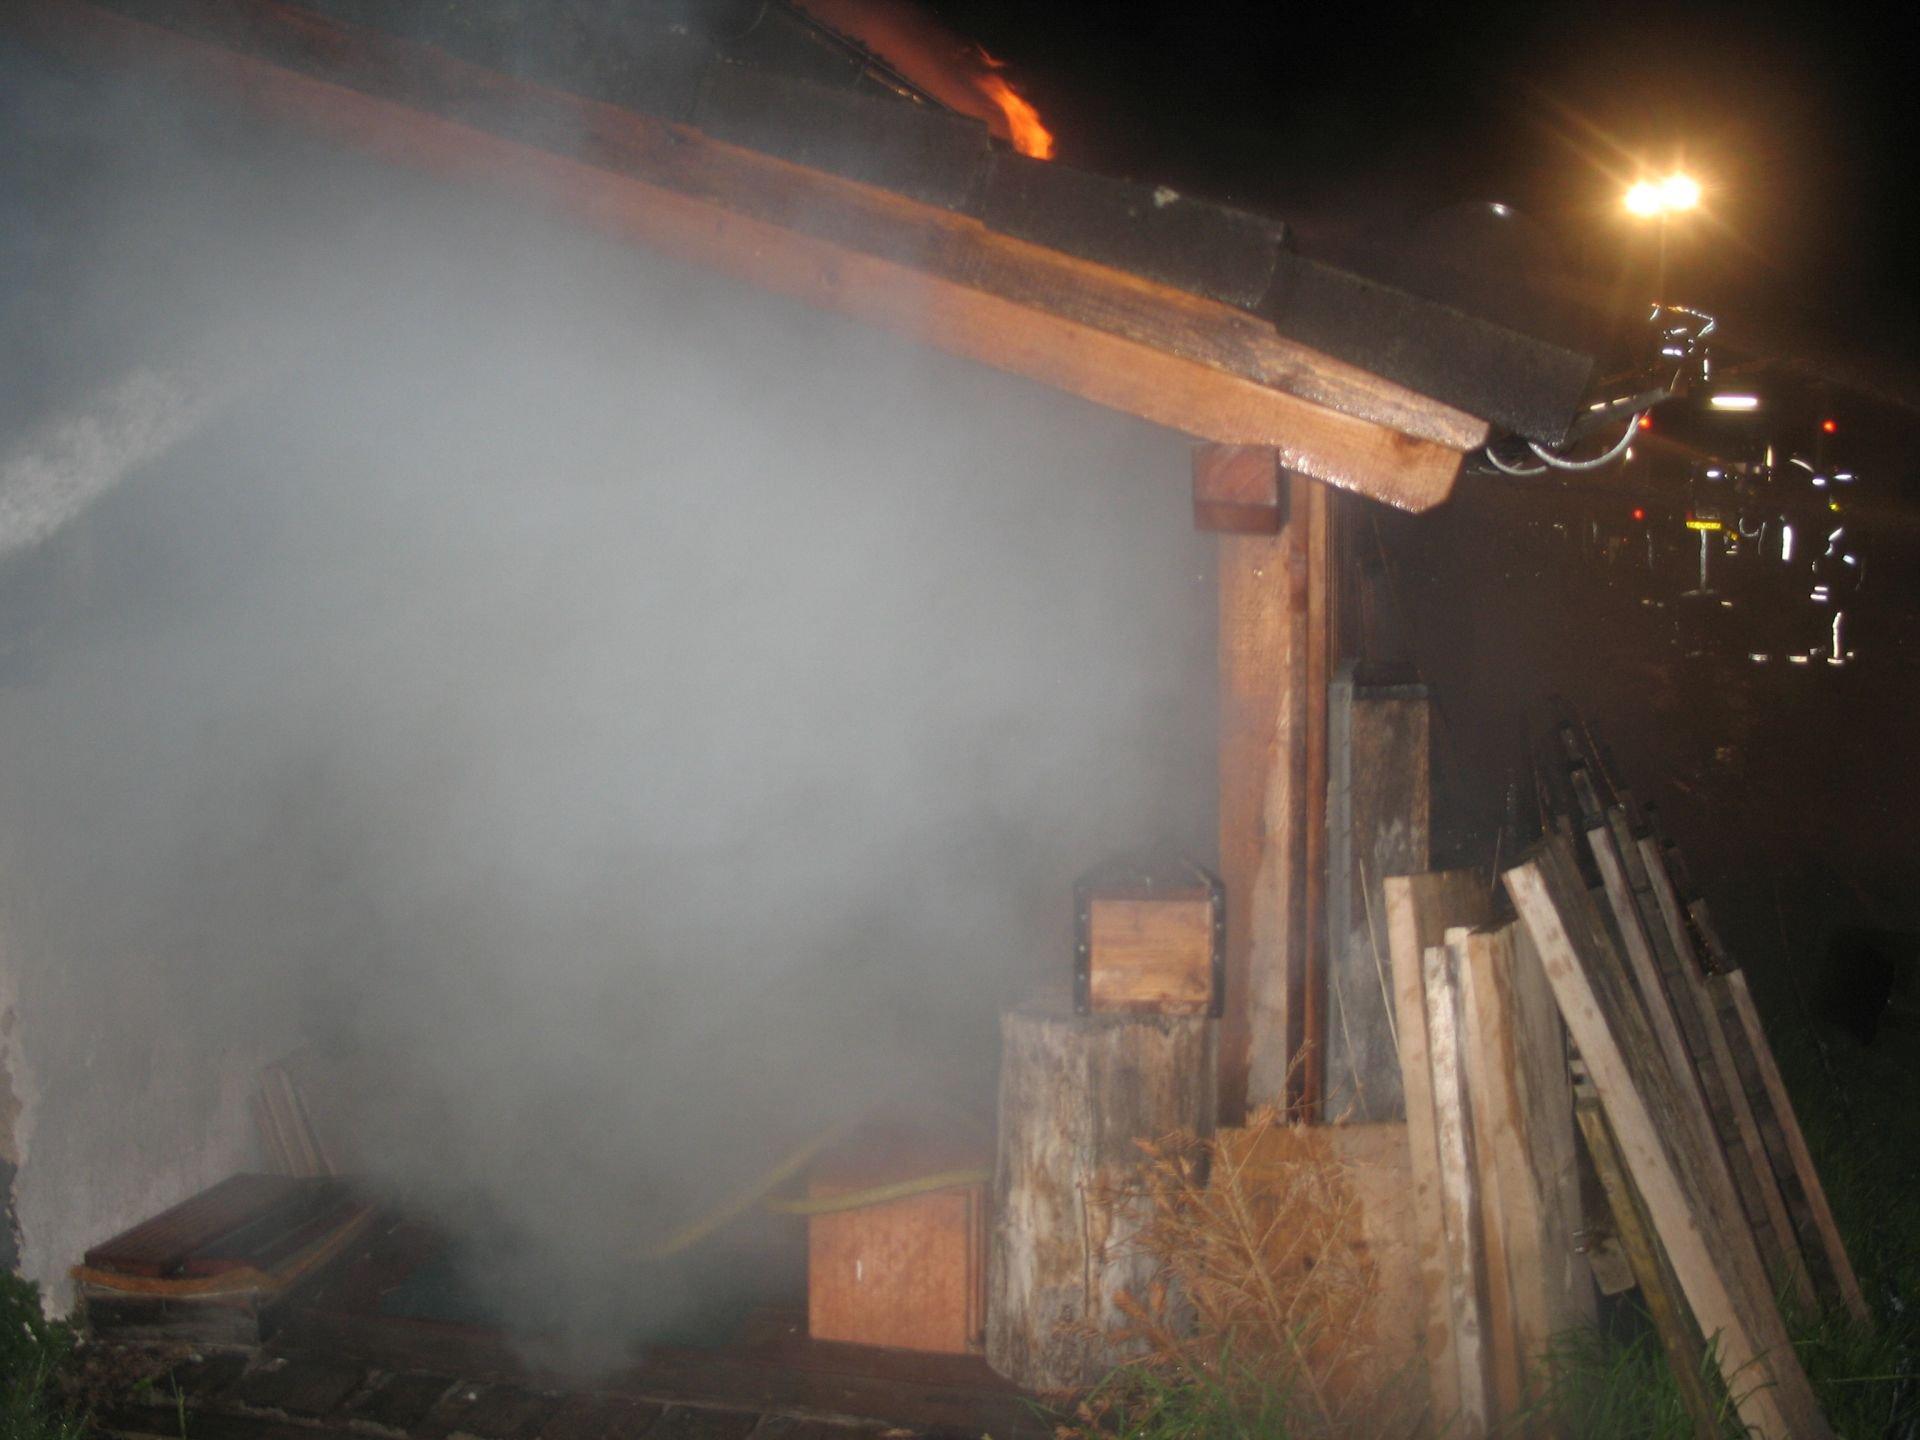 freiwillige feuerwehr wartenberg brand ger teschuppen mit holzlager. Black Bedroom Furniture Sets. Home Design Ideas